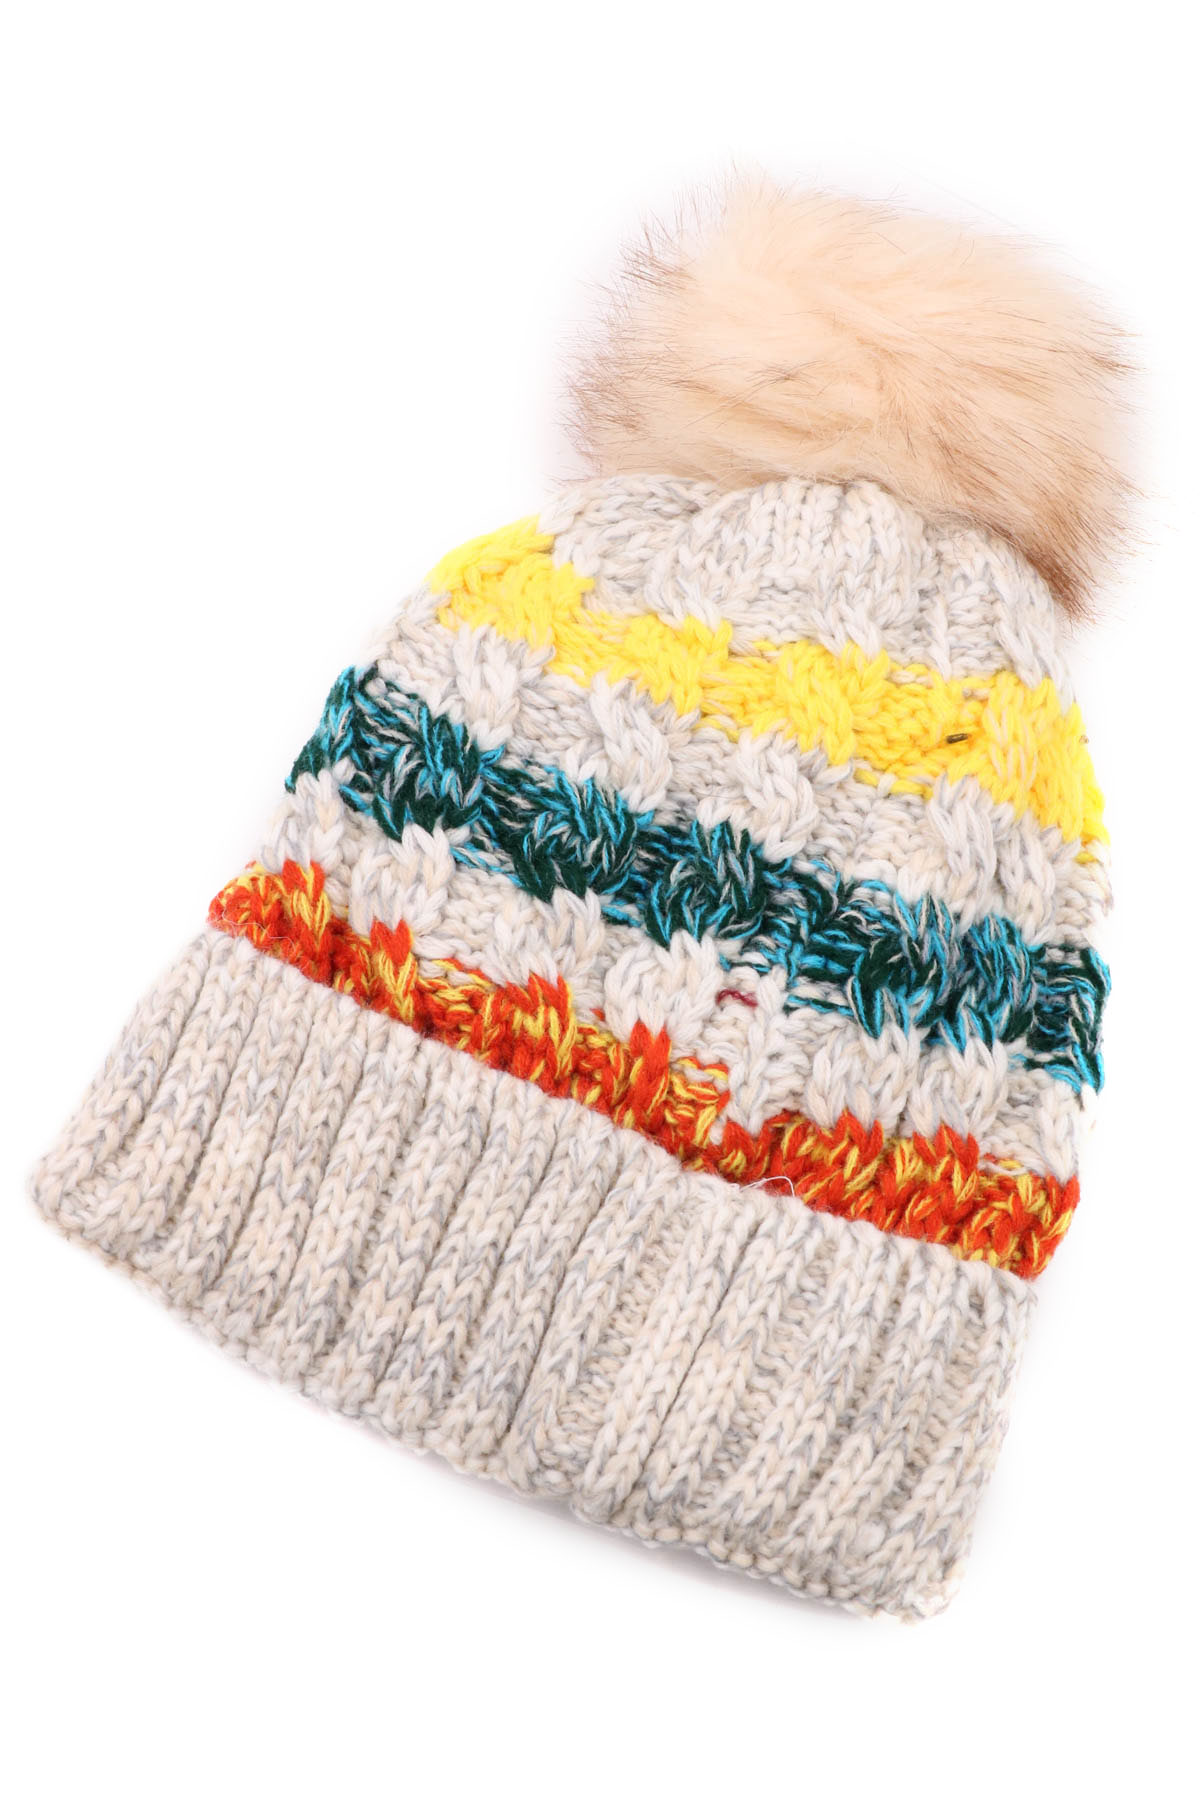 Knit Fur Beanie - Hats